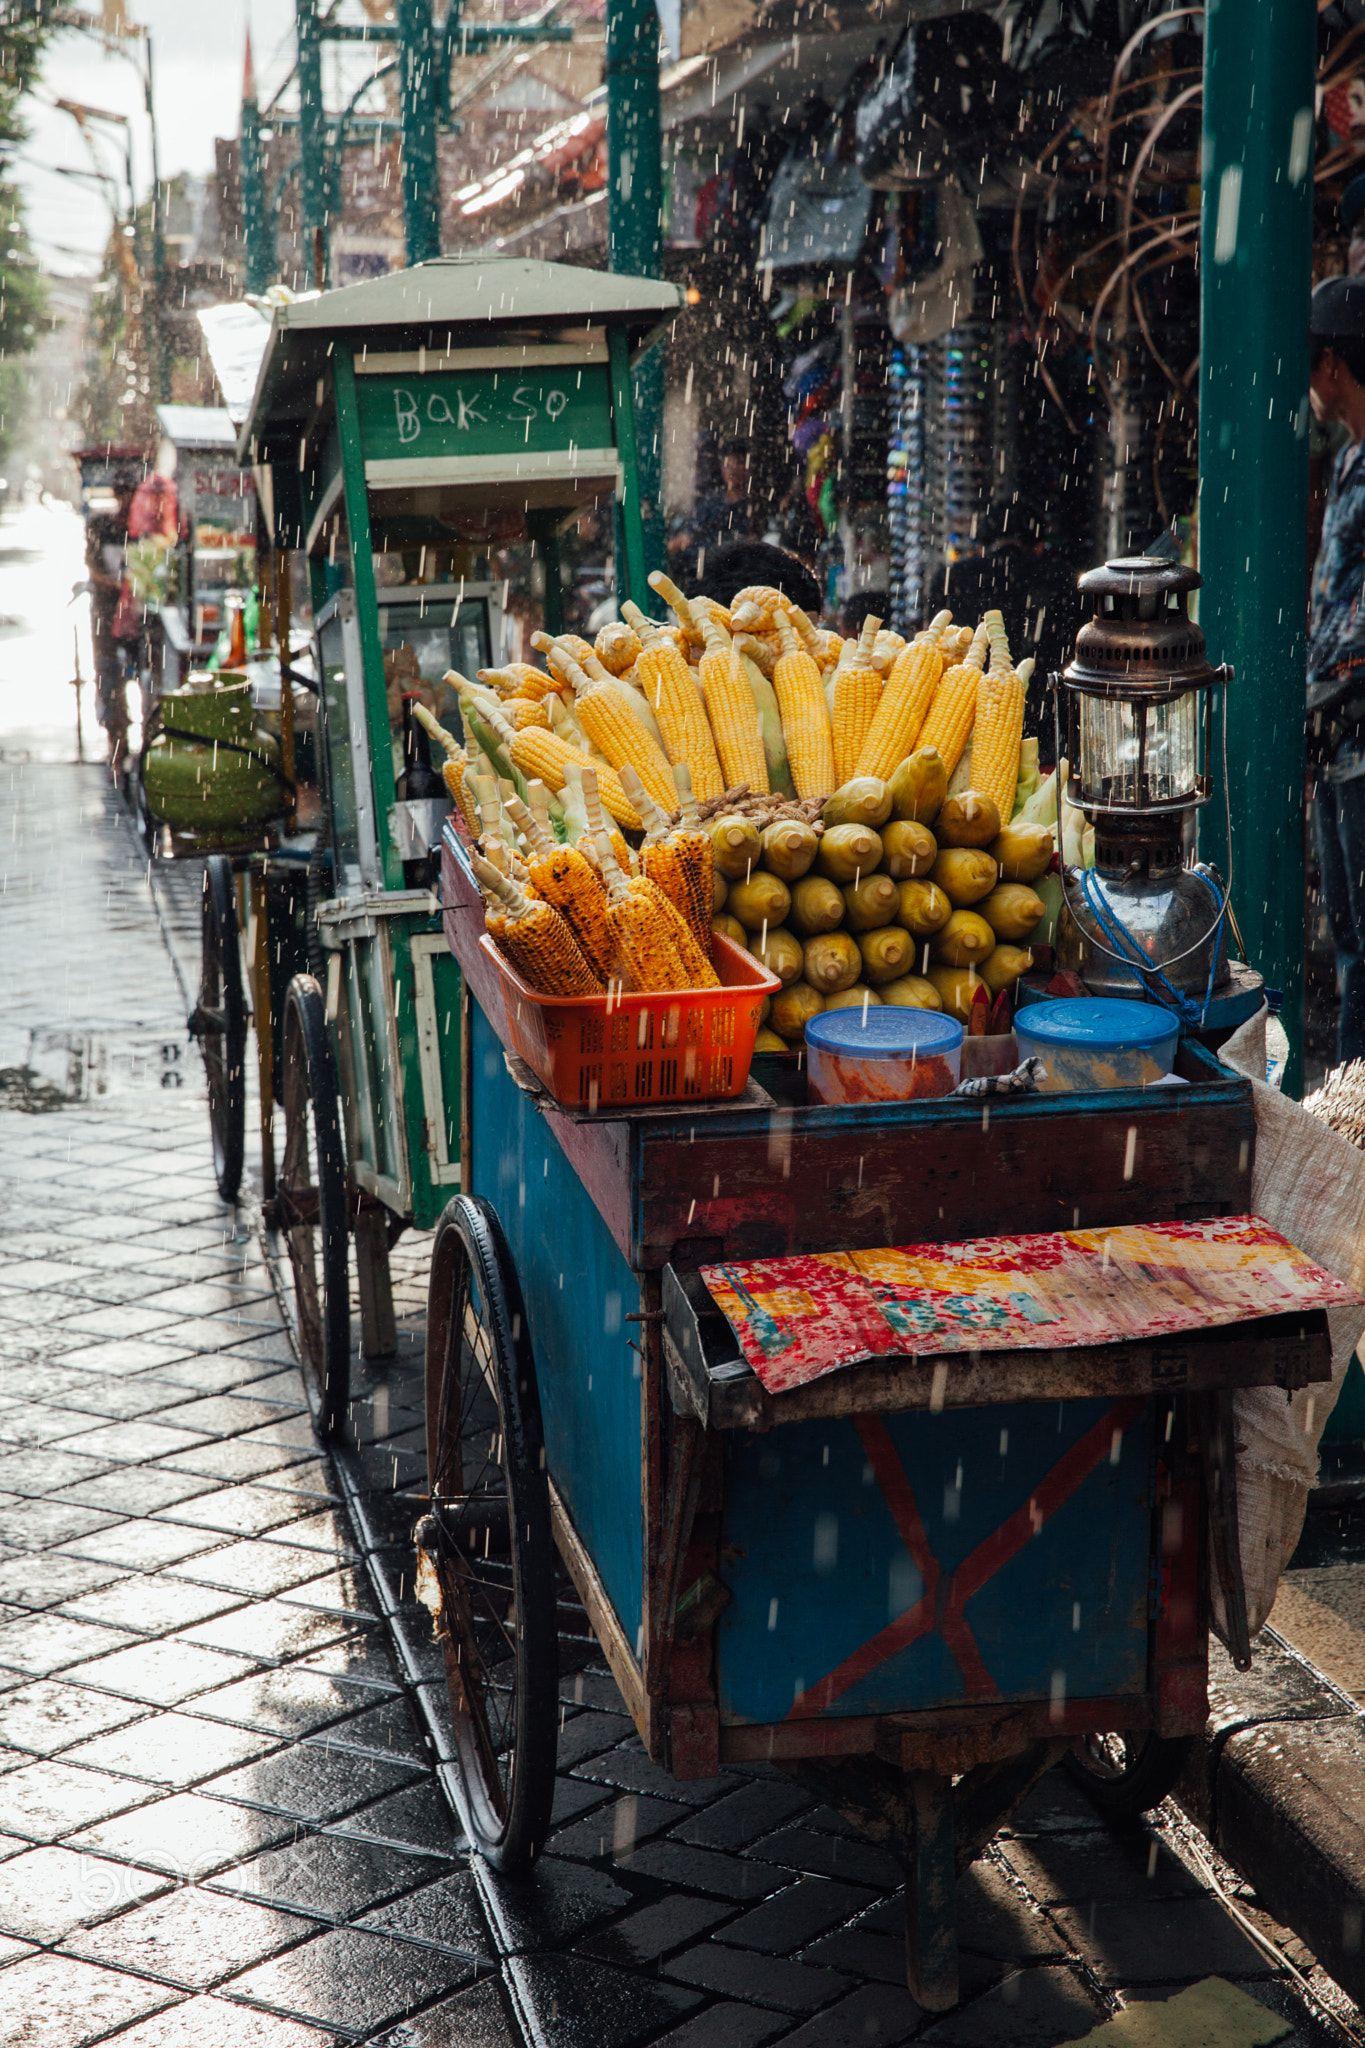 Street food stall with grilled corn, Bali Street food